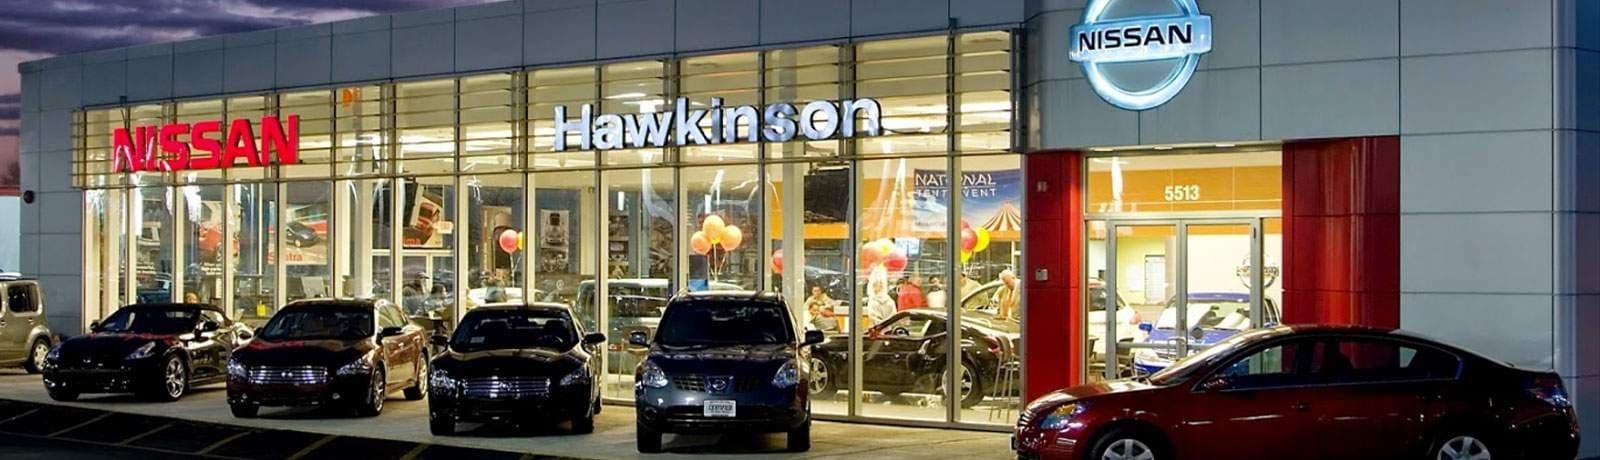 Hawkinson Nissan Matteson Auto Mall image